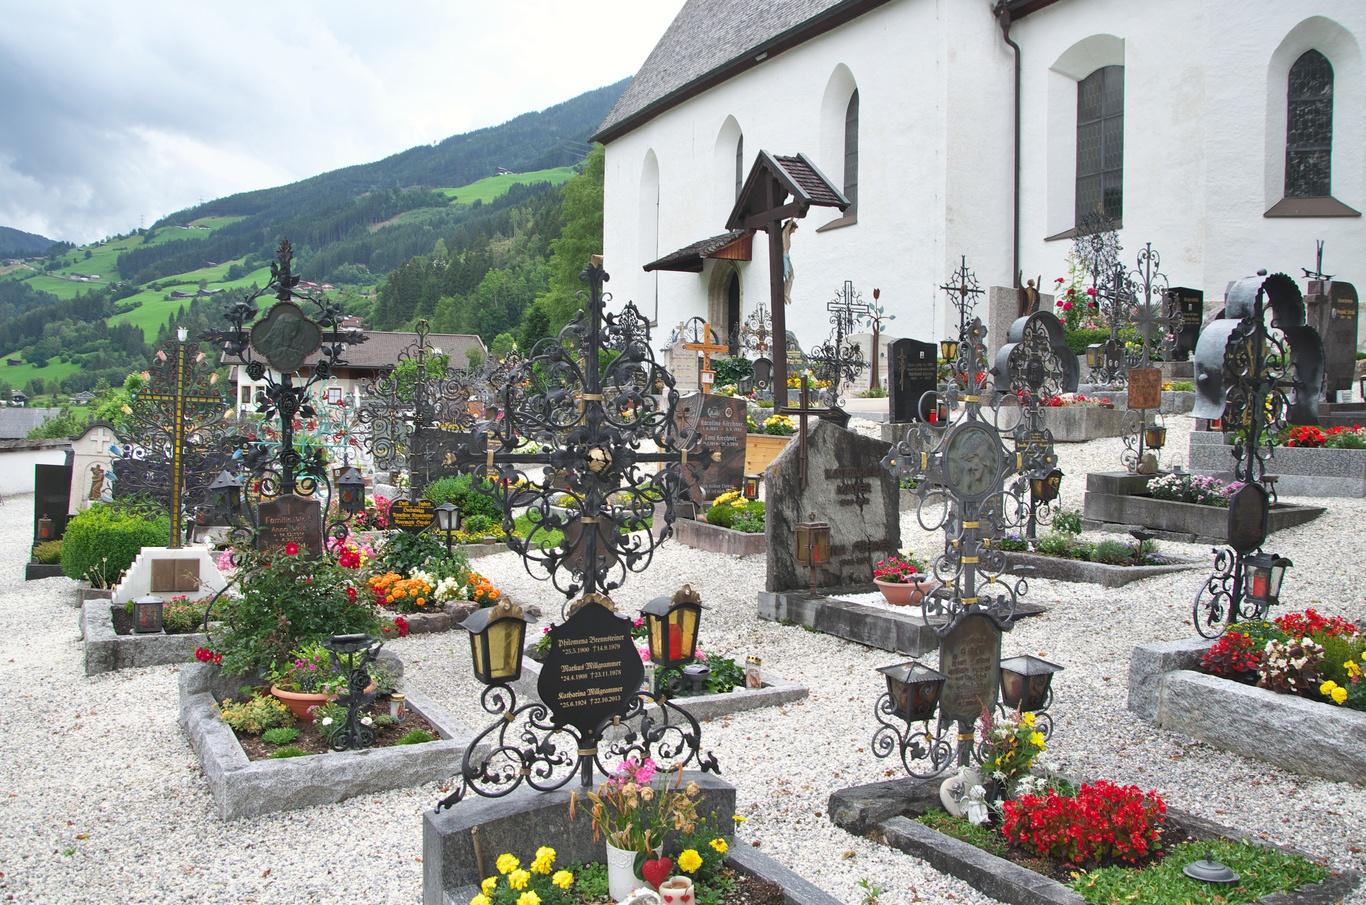 Hřbitov v obci Wald im Pinzgau